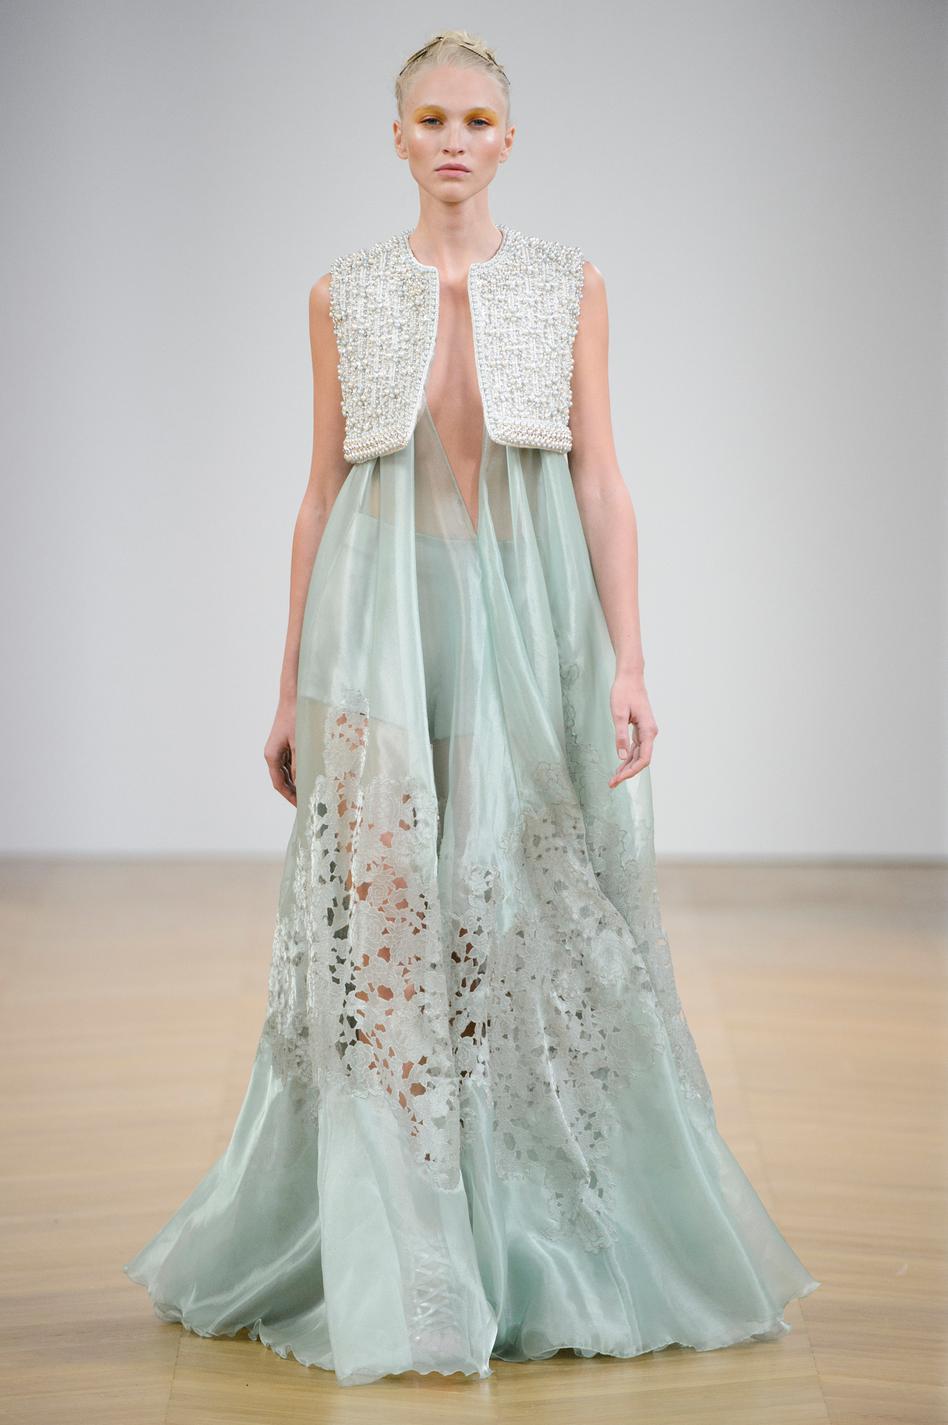 Connu Dior, Chanel, Valentino : le grand bal des robes de rêves HQ41